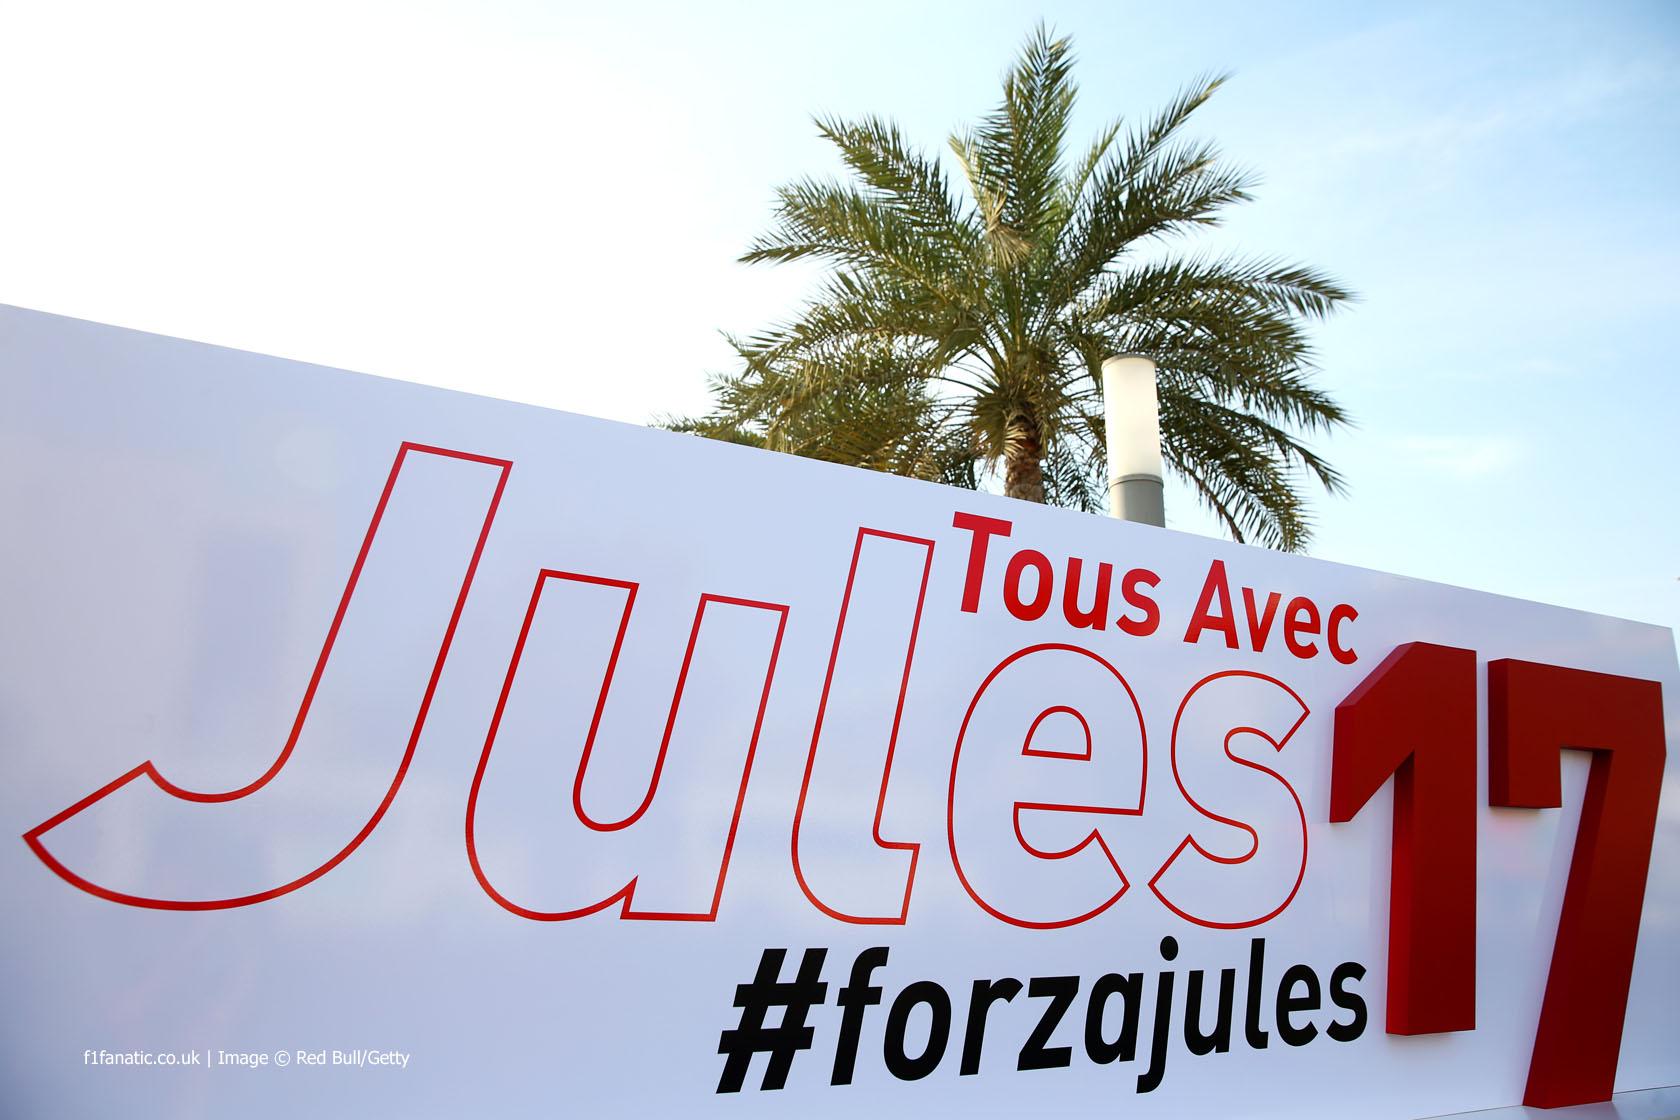 Jules Bianchi tribute, Yas Marina, 2014